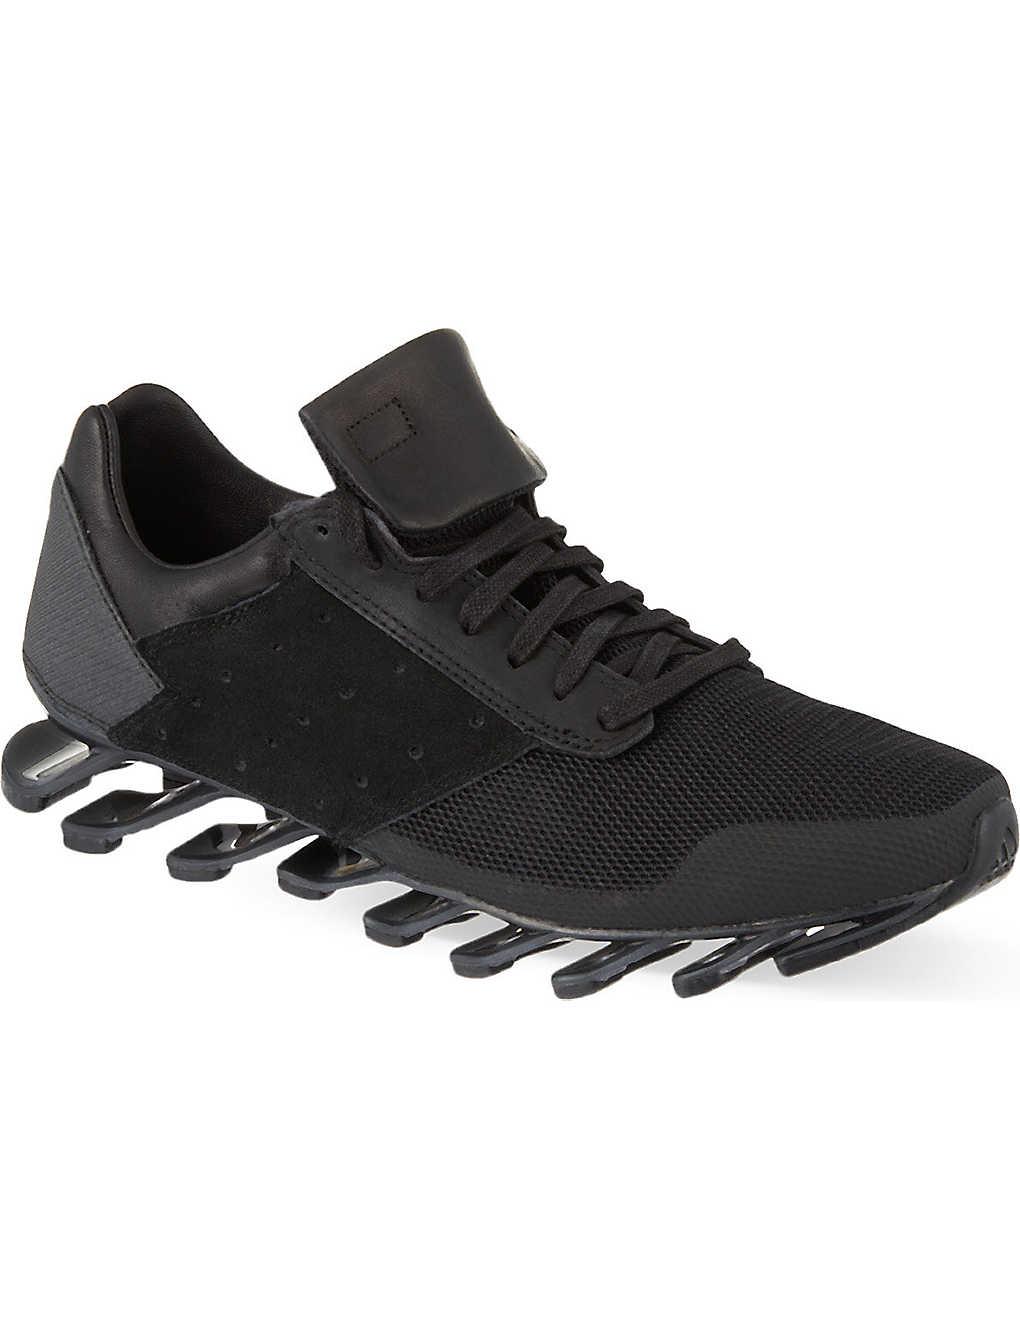 best service 92bb1 f9577 ADIDAS - Rick Owens X Adidas Springblade low trainers ...